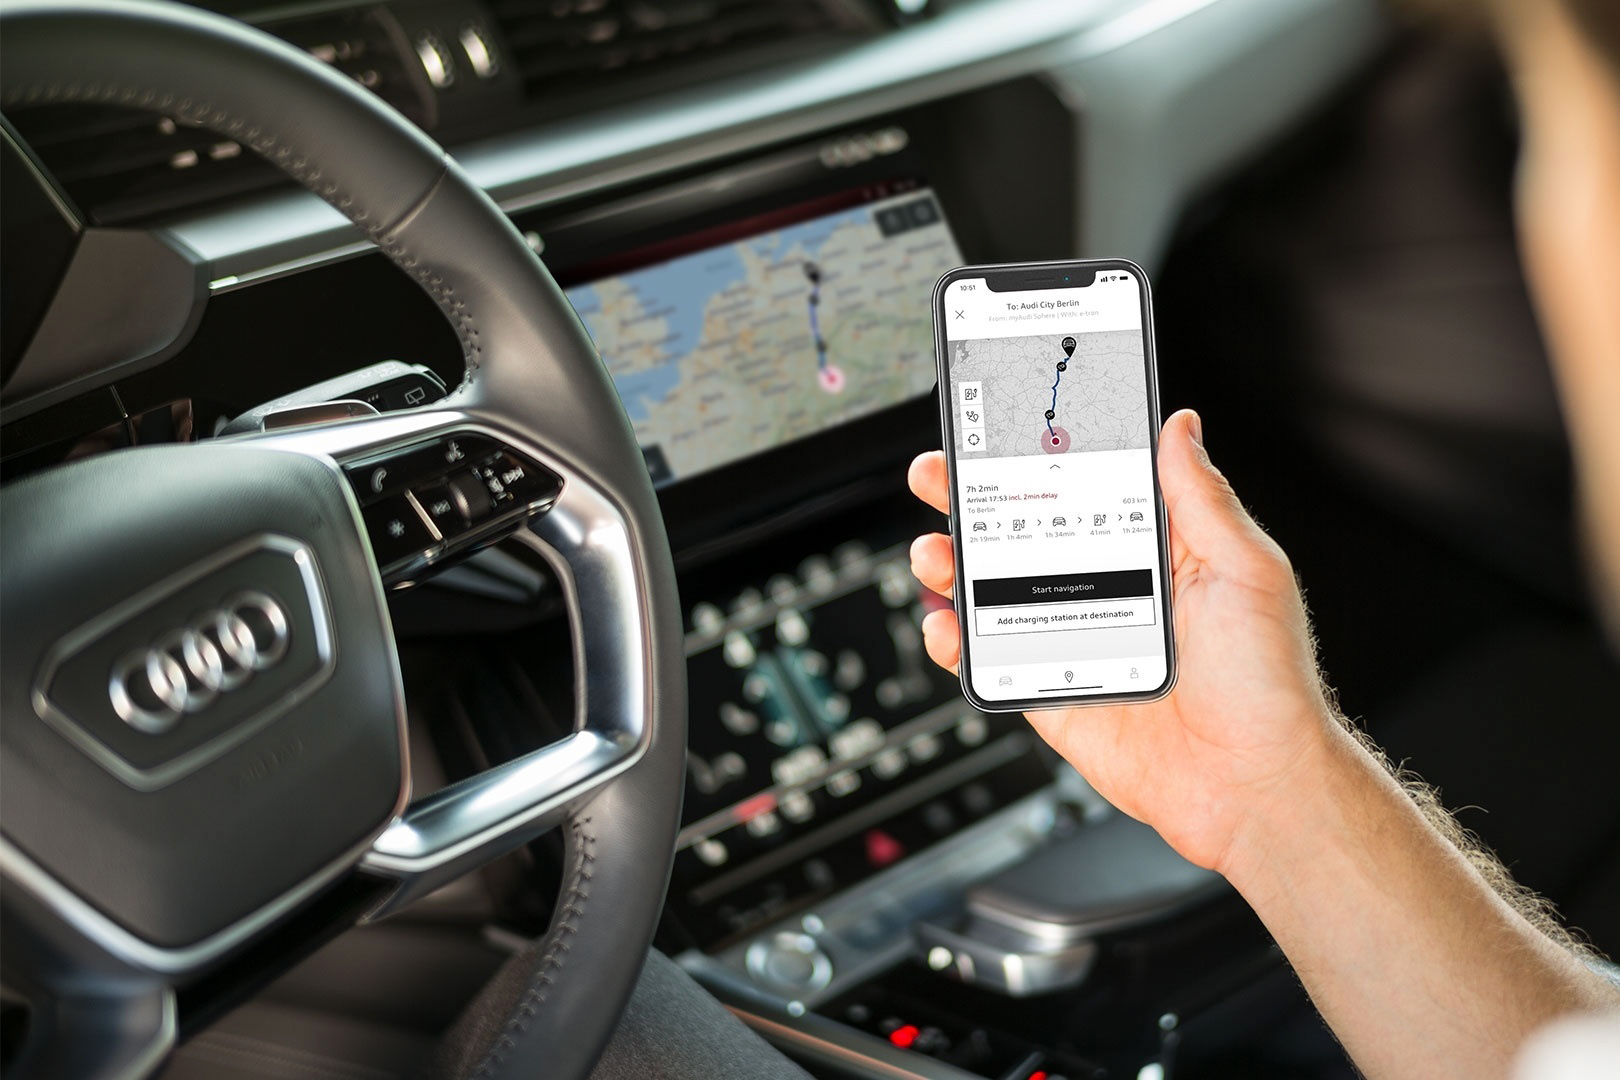 Das Infotainment-System des Audi e-tron kann so gut wie alles – ausser Bündner Dialekt. (Foto: Audi)